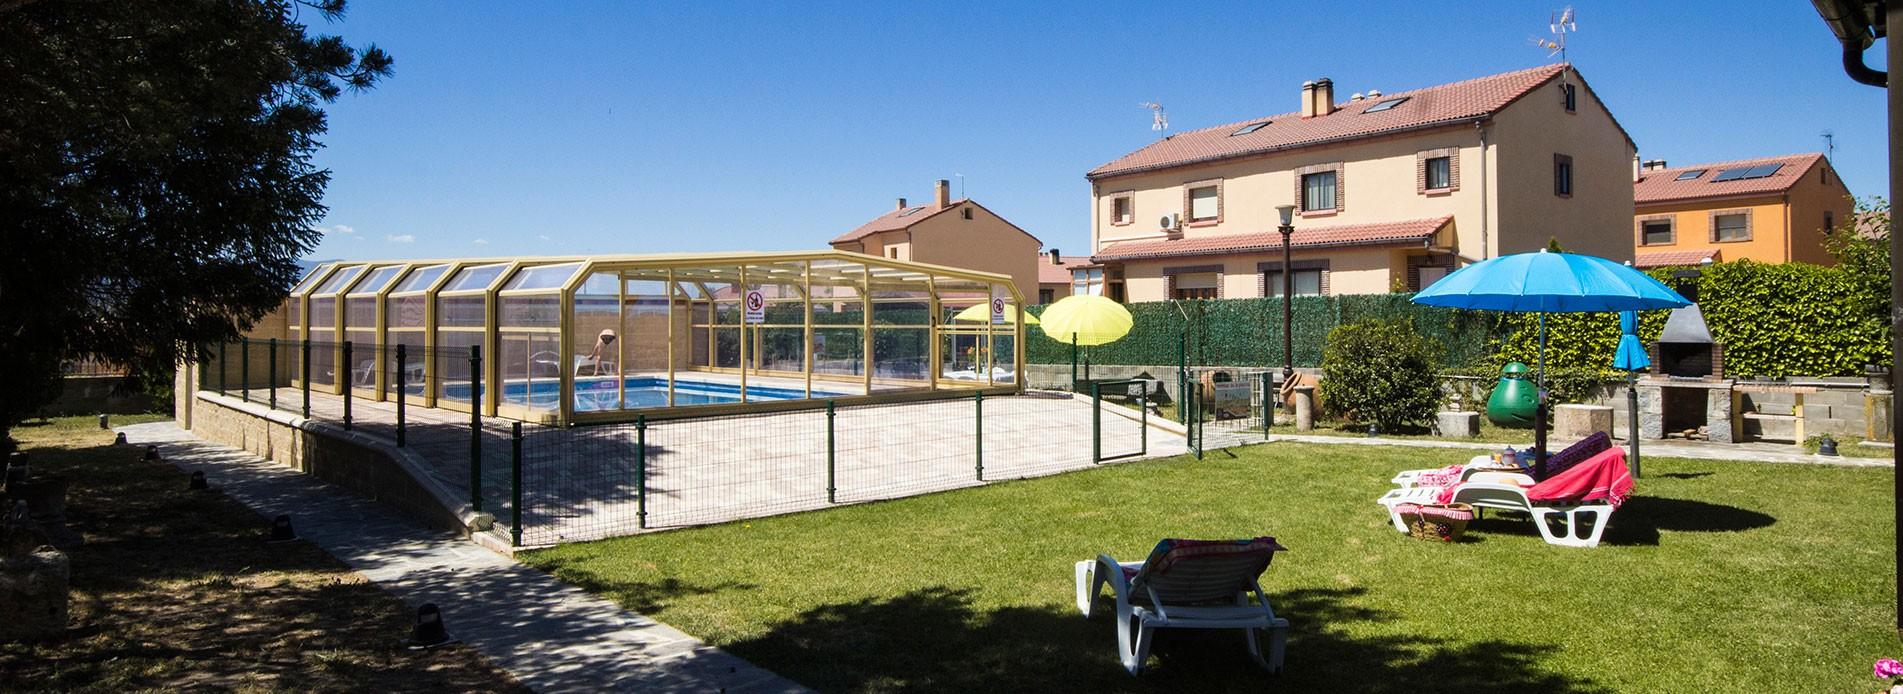 slider2-estancias-rurales-charming-hotels-segovia